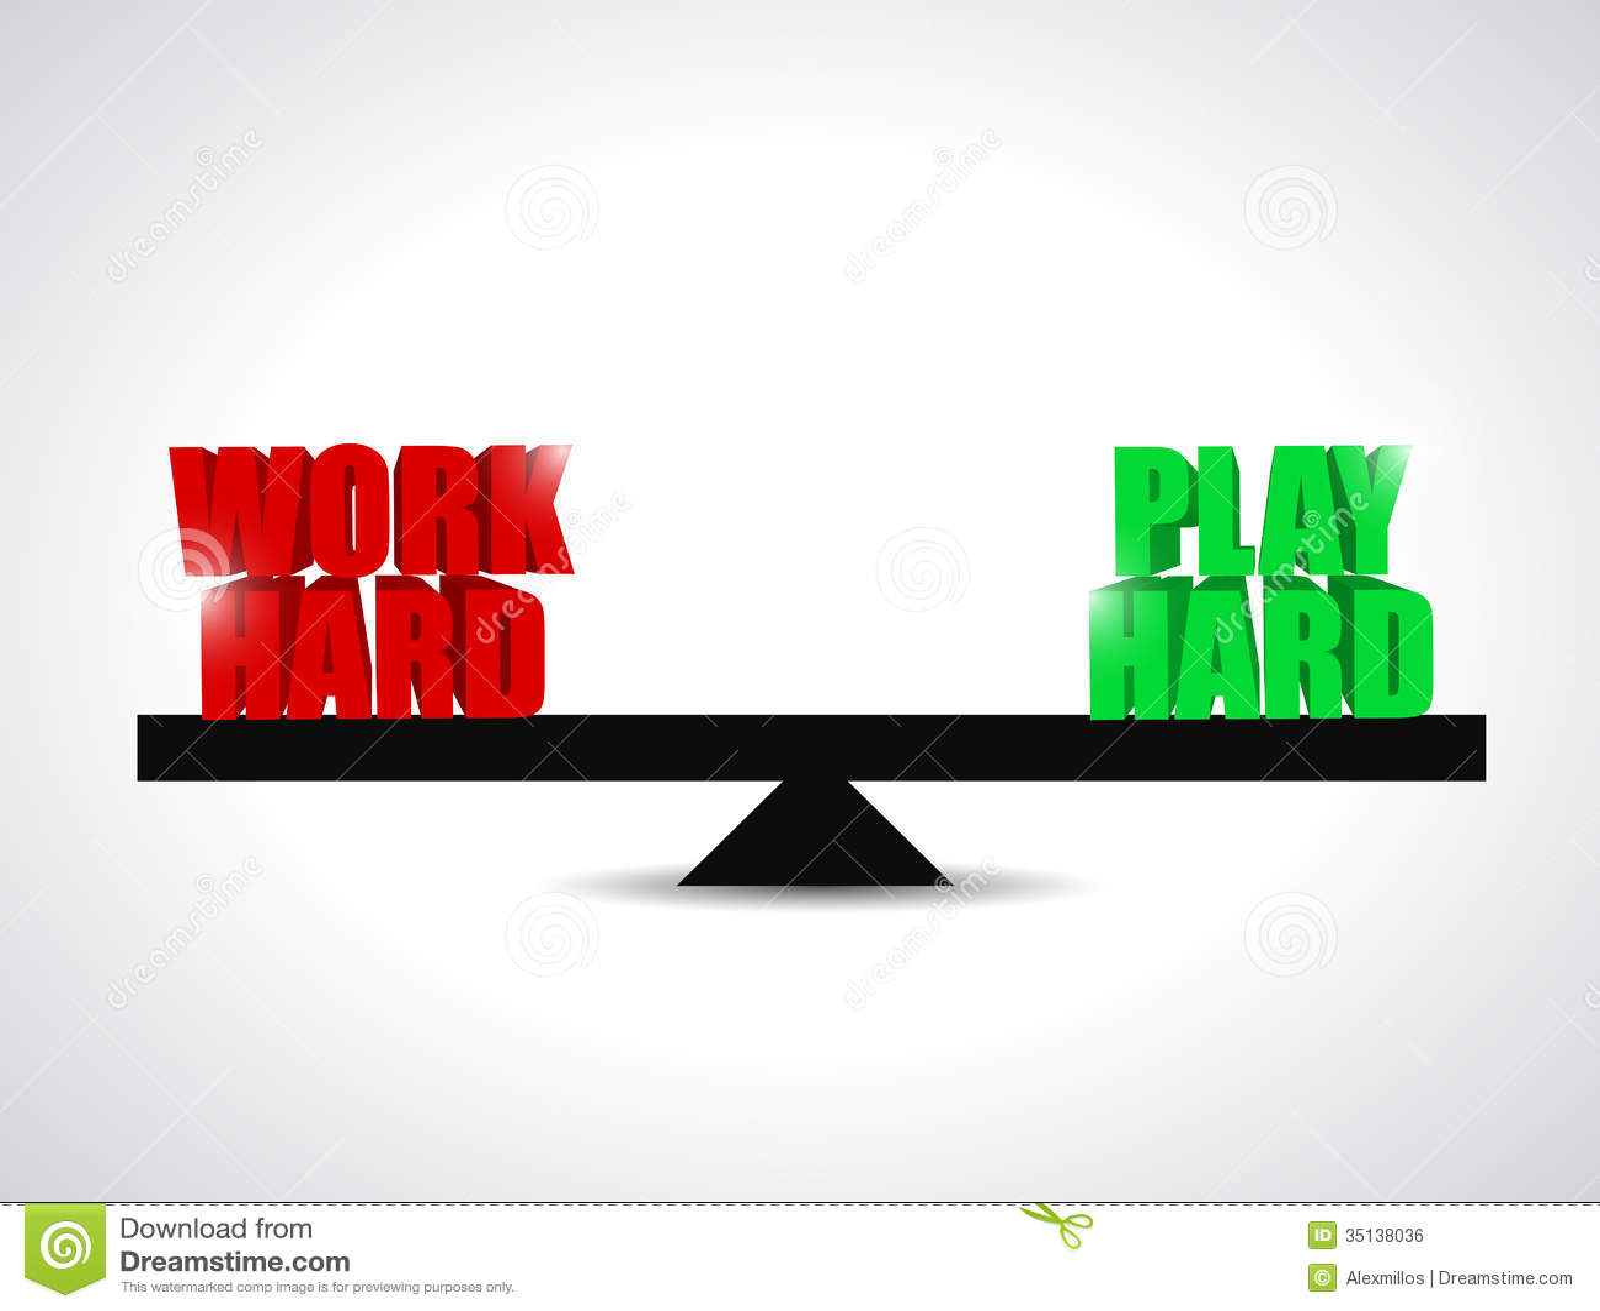 Balance Between Work Had And Play Hard Concept Royalty